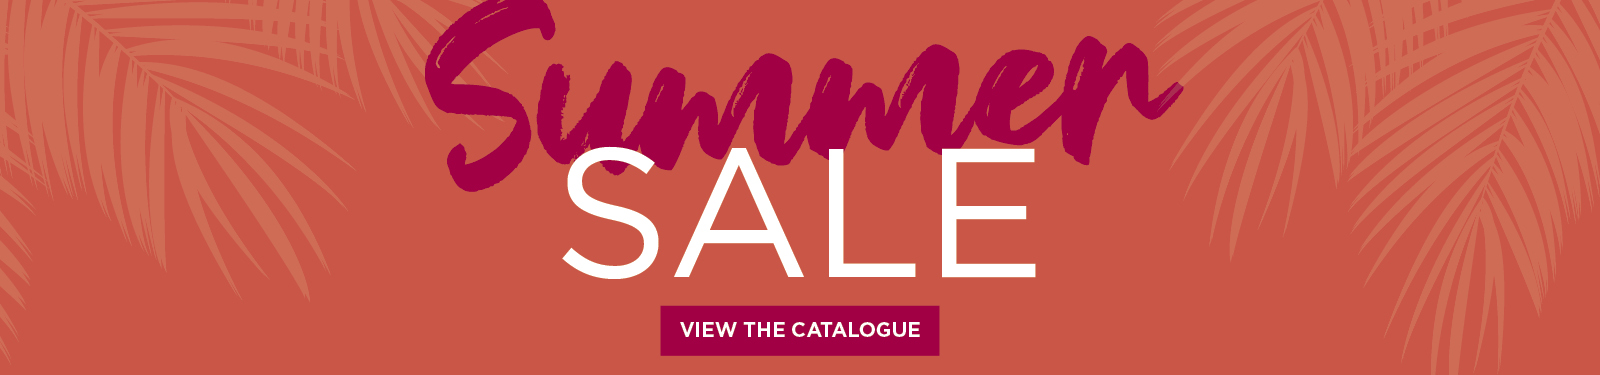 se0029-summer-sale-web-banner-1600x375px.jpg